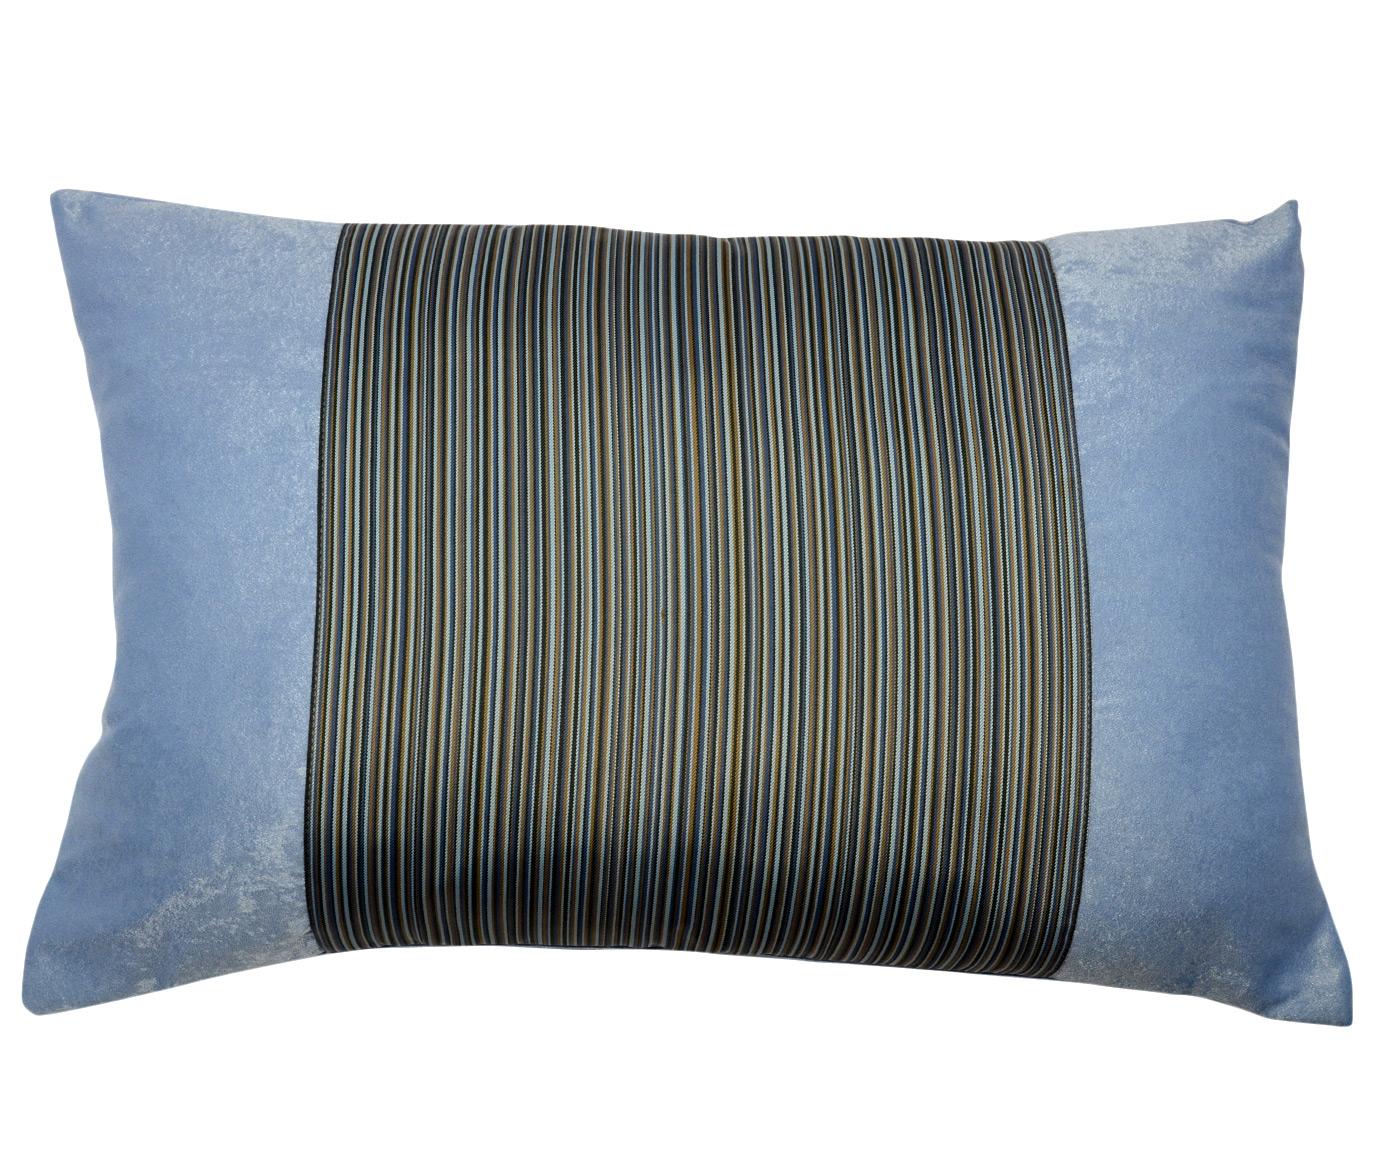 Подушка АвисКвадратные подушки и наволочки<br>Декоративная  подушка .Чехол съемный.<br><br>Material: Вискоза<br>Length см: None<br>Width см: 60<br>Depth см: 15<br>Height см: 40